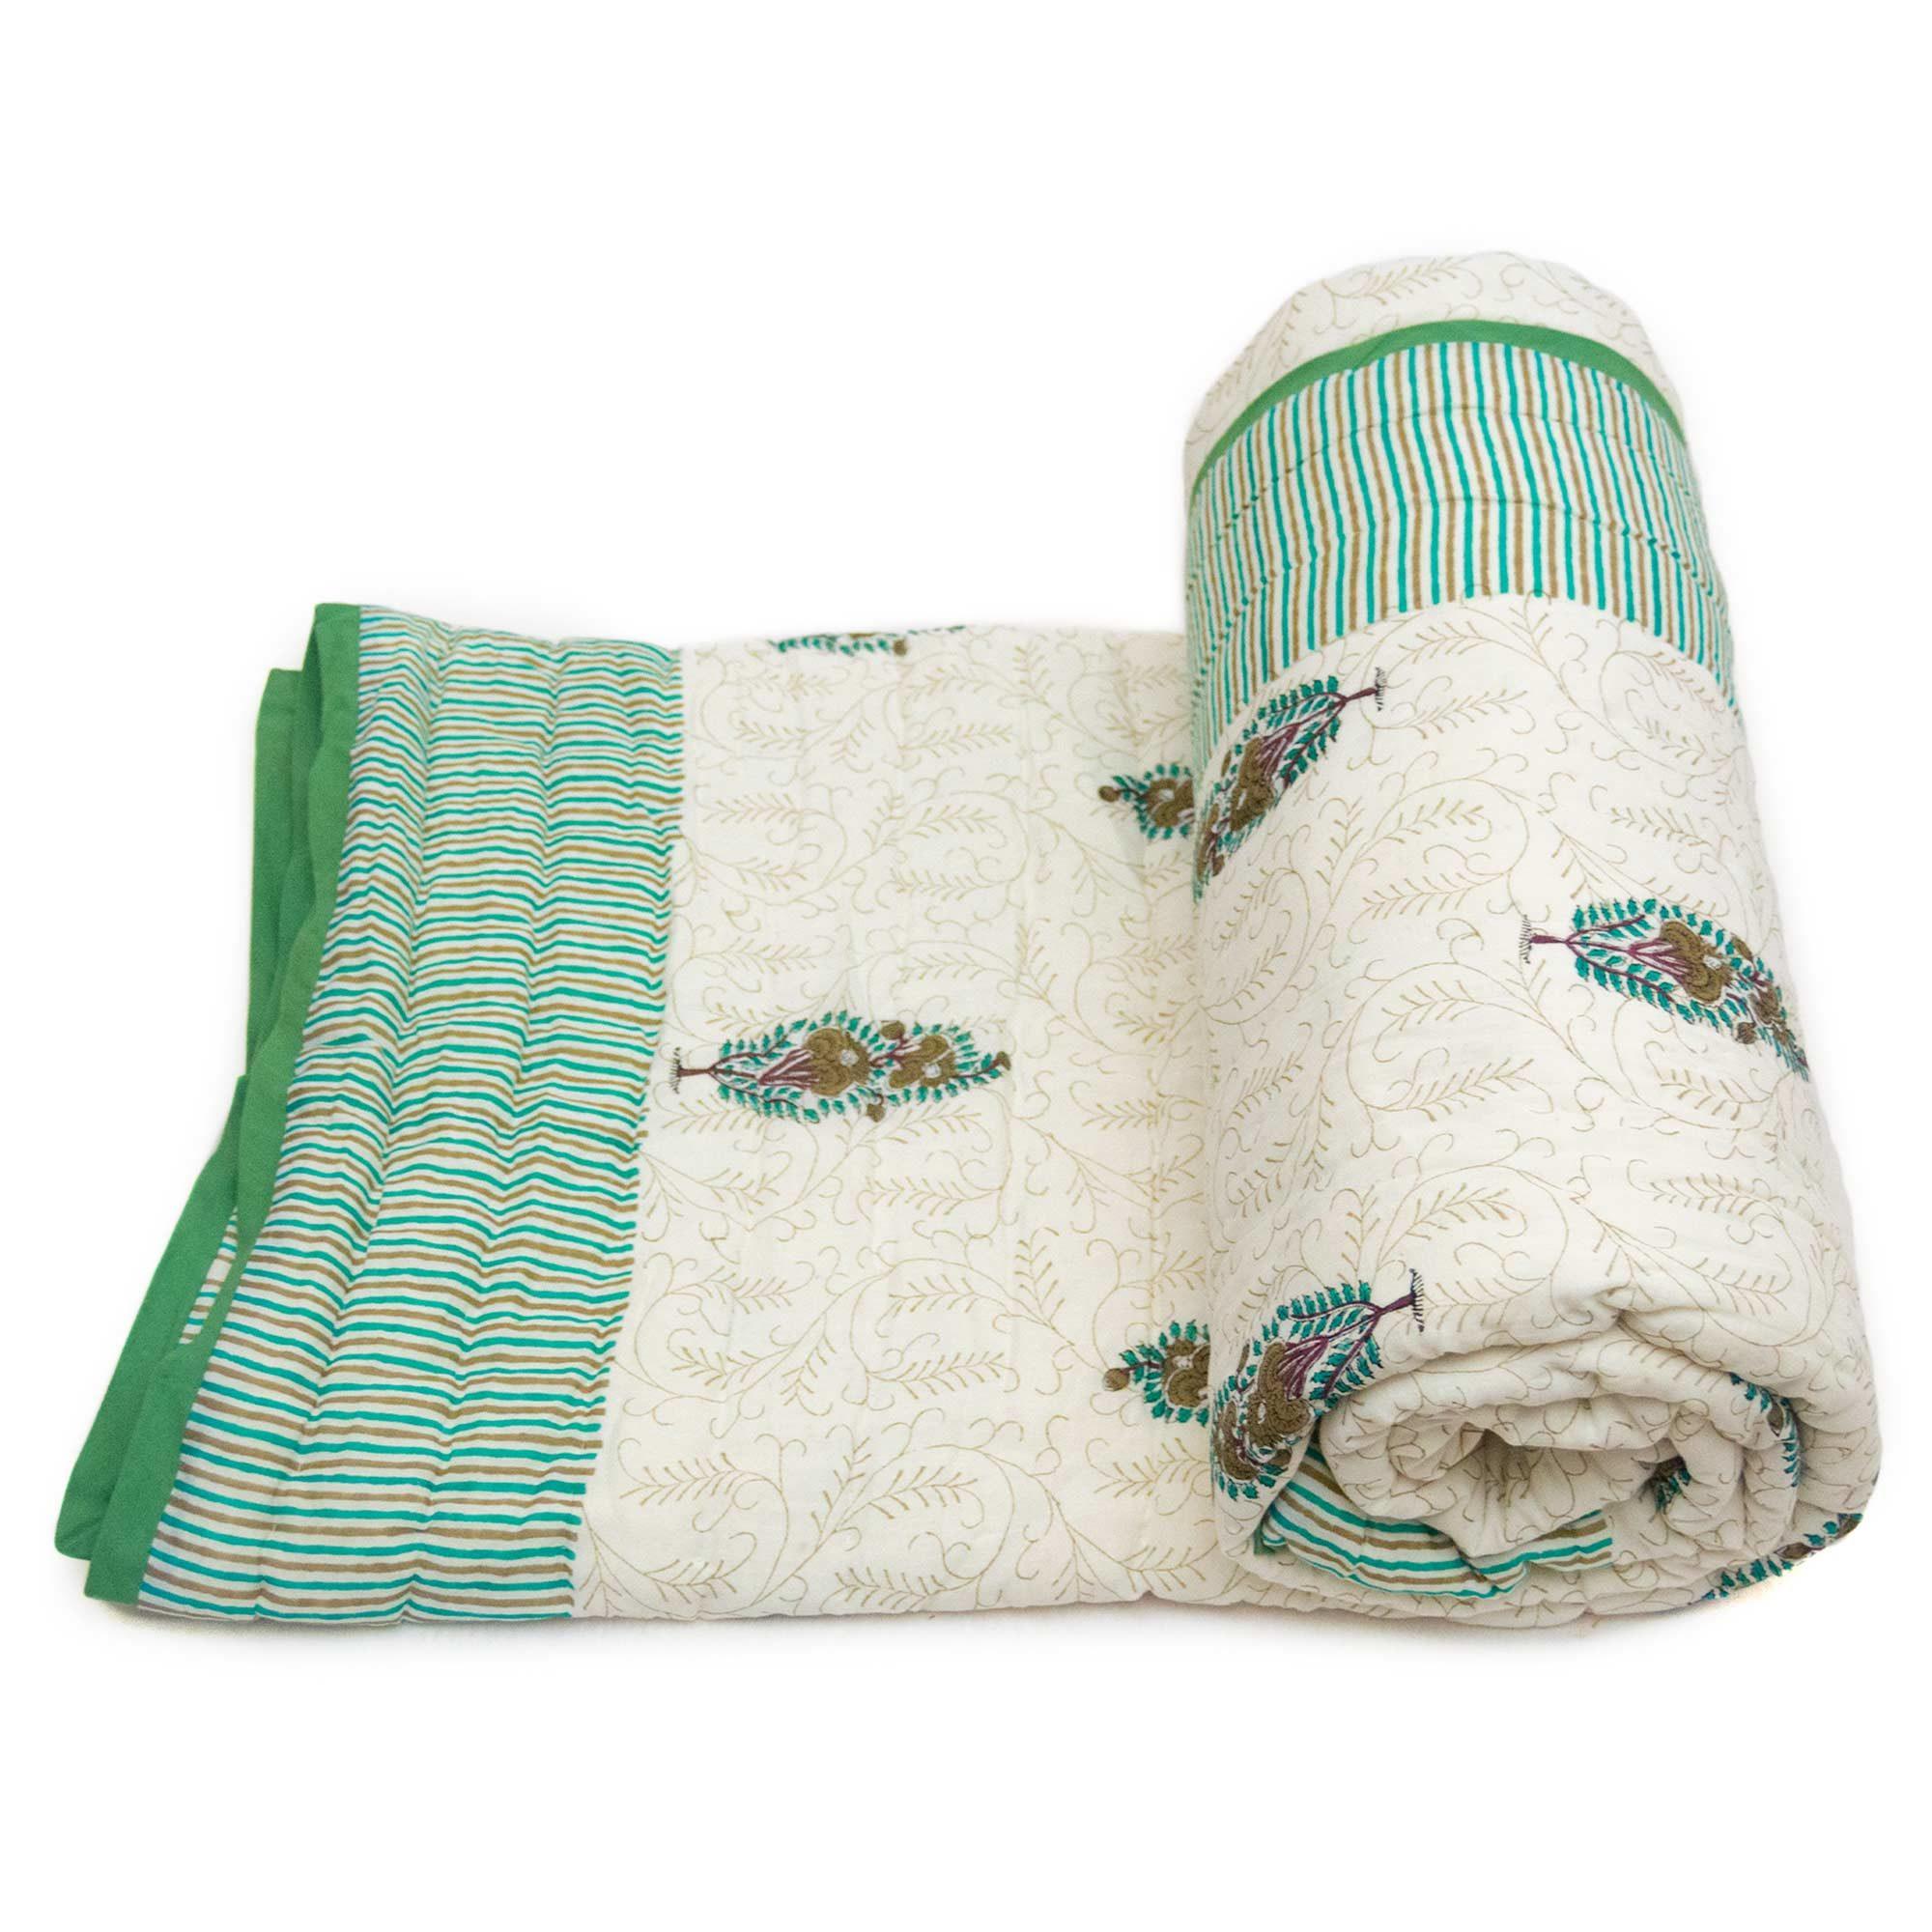 Tara-Textile - indische Decke - Kuscheldecke Tamani